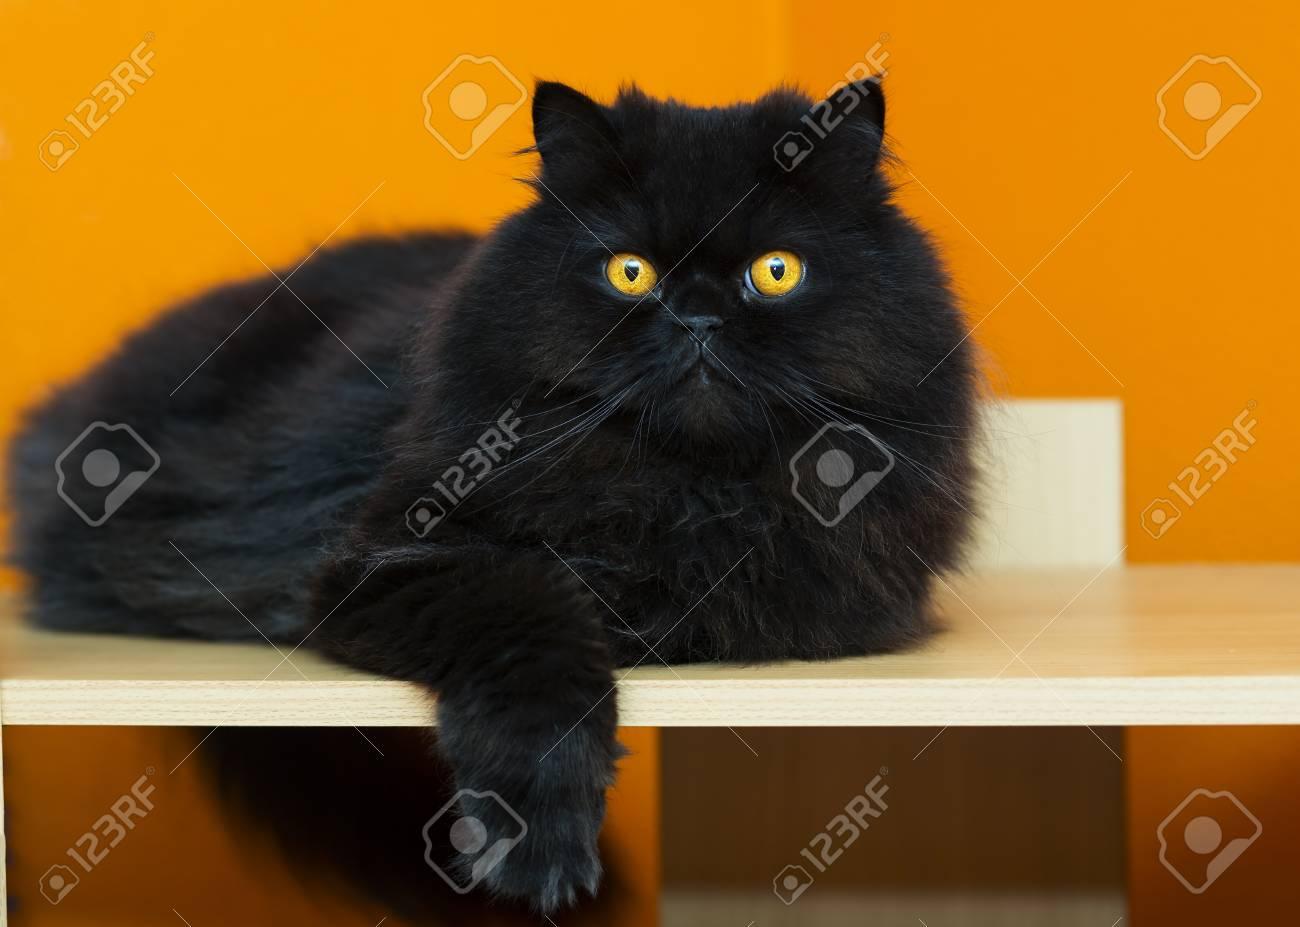 Black male cat taking rest at orange background Stock Photo - 21926914